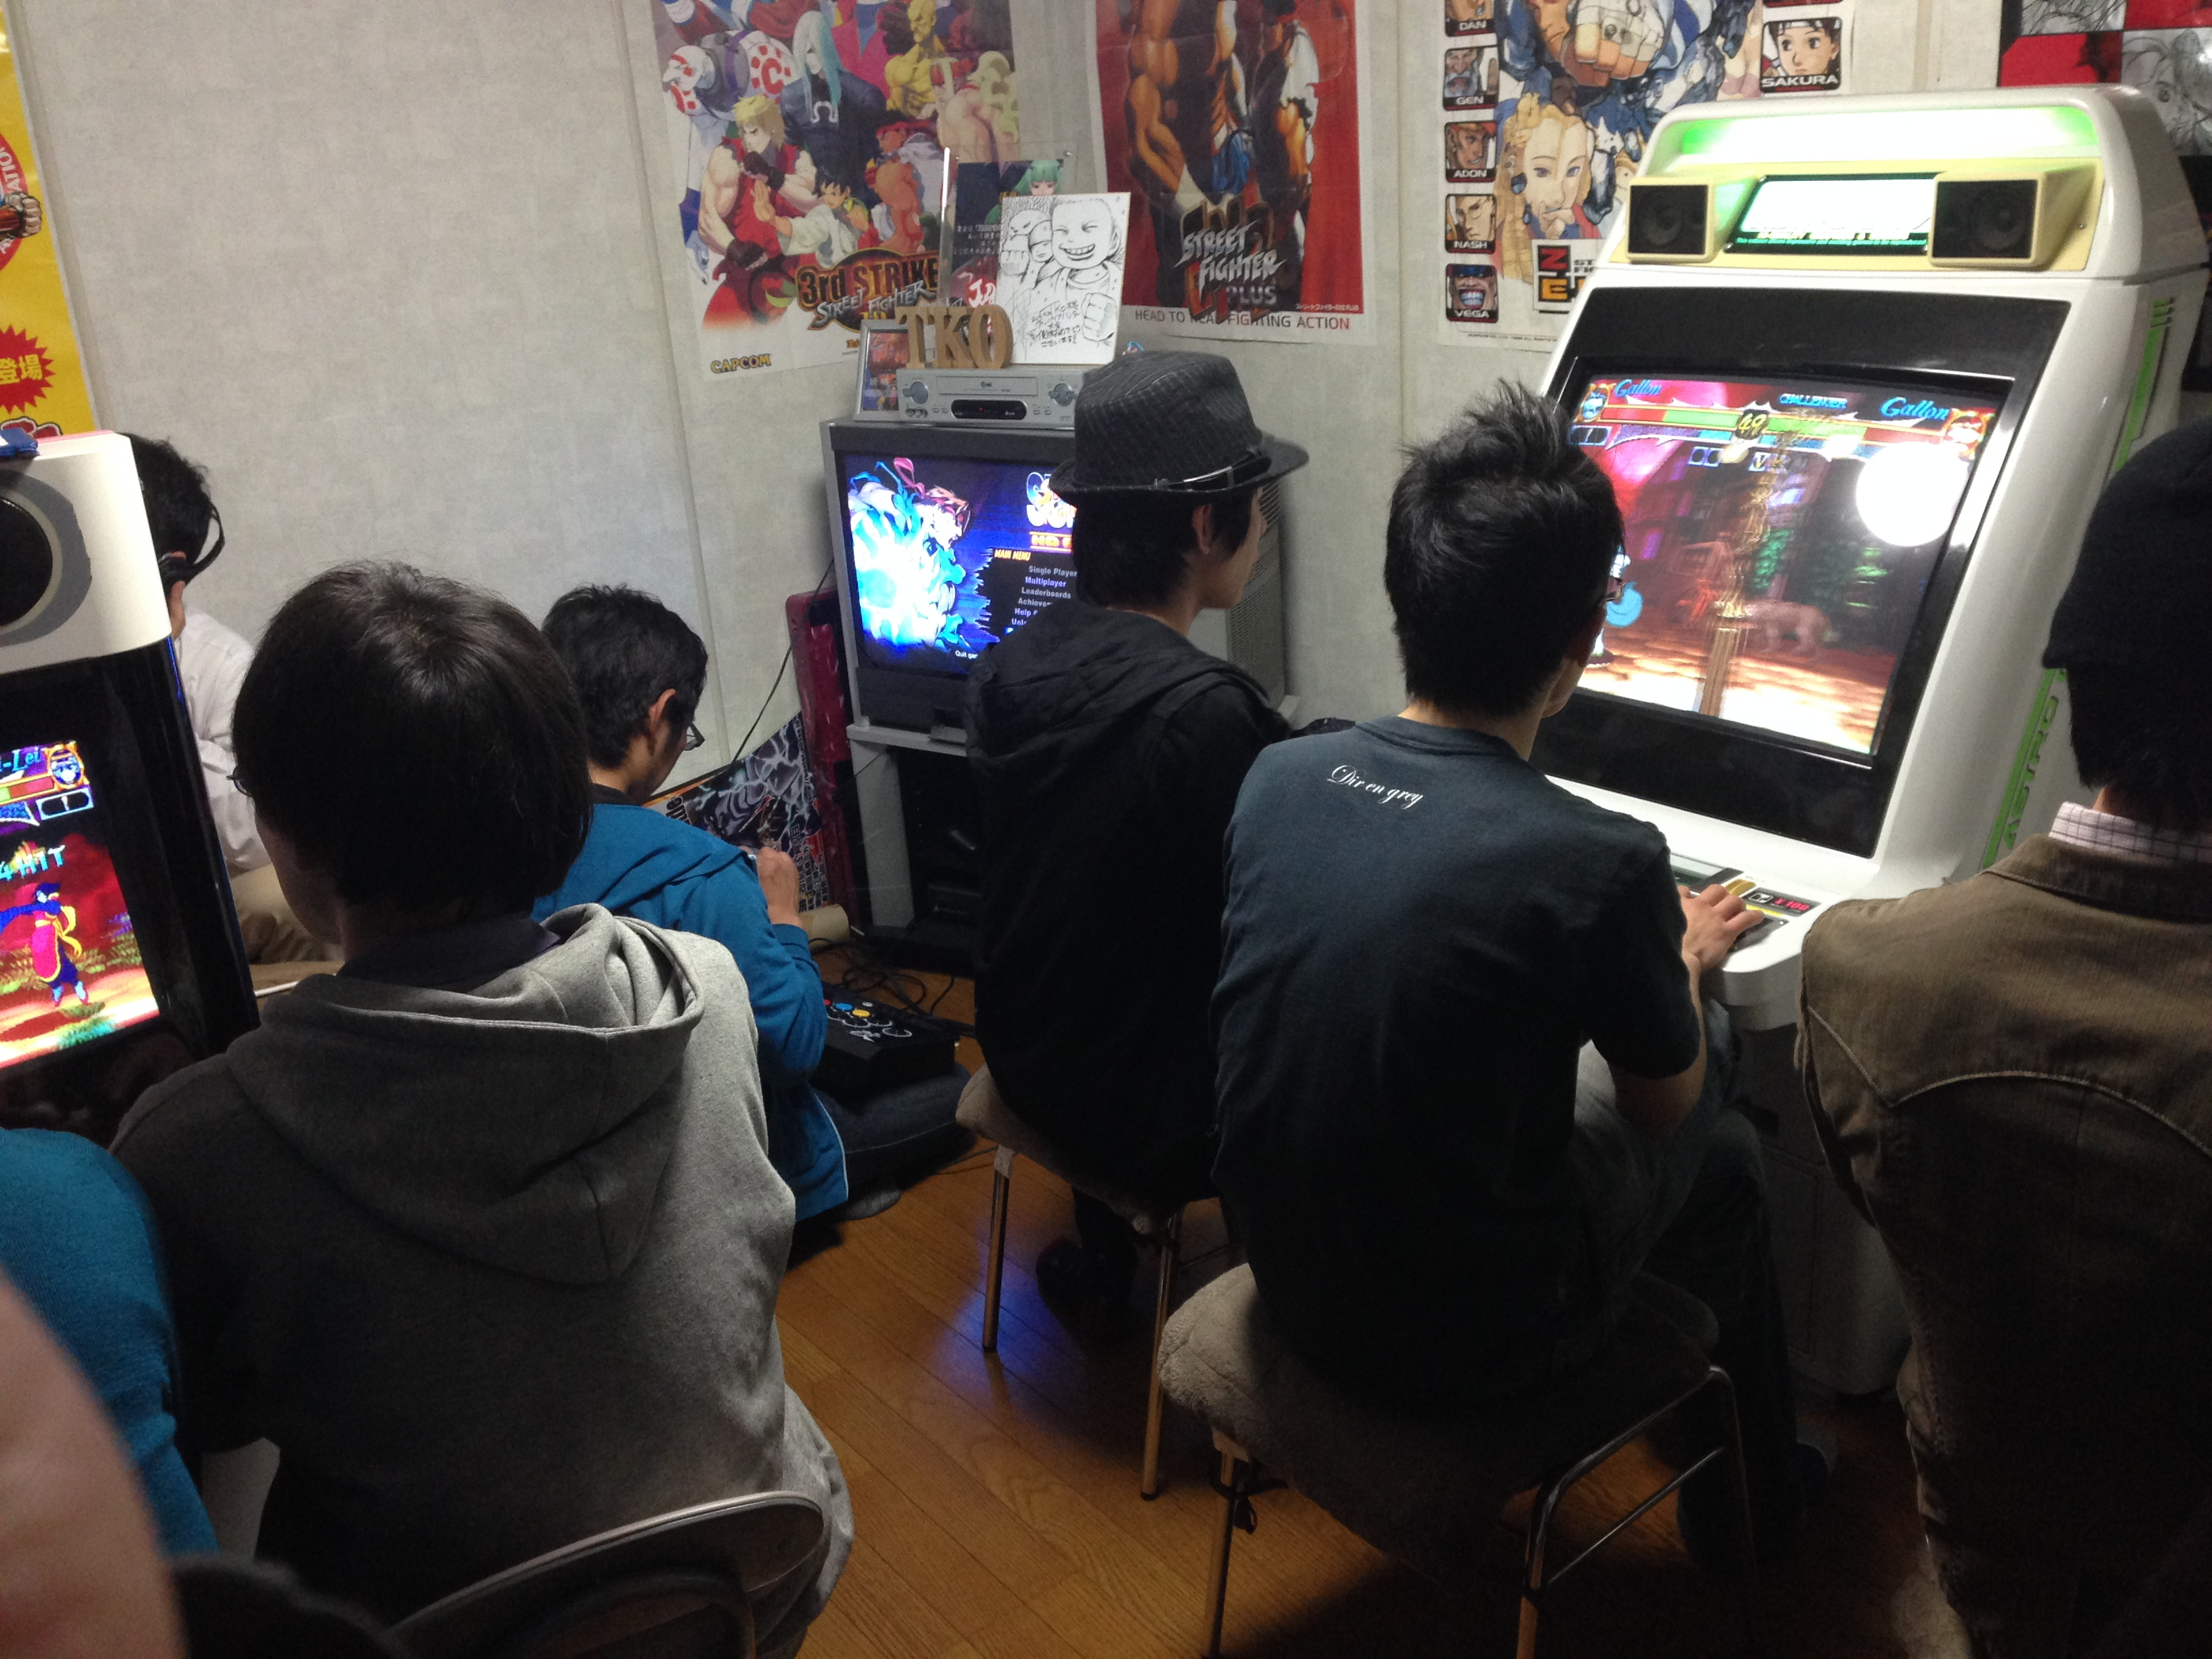 2015.4.26VHC若葉予選